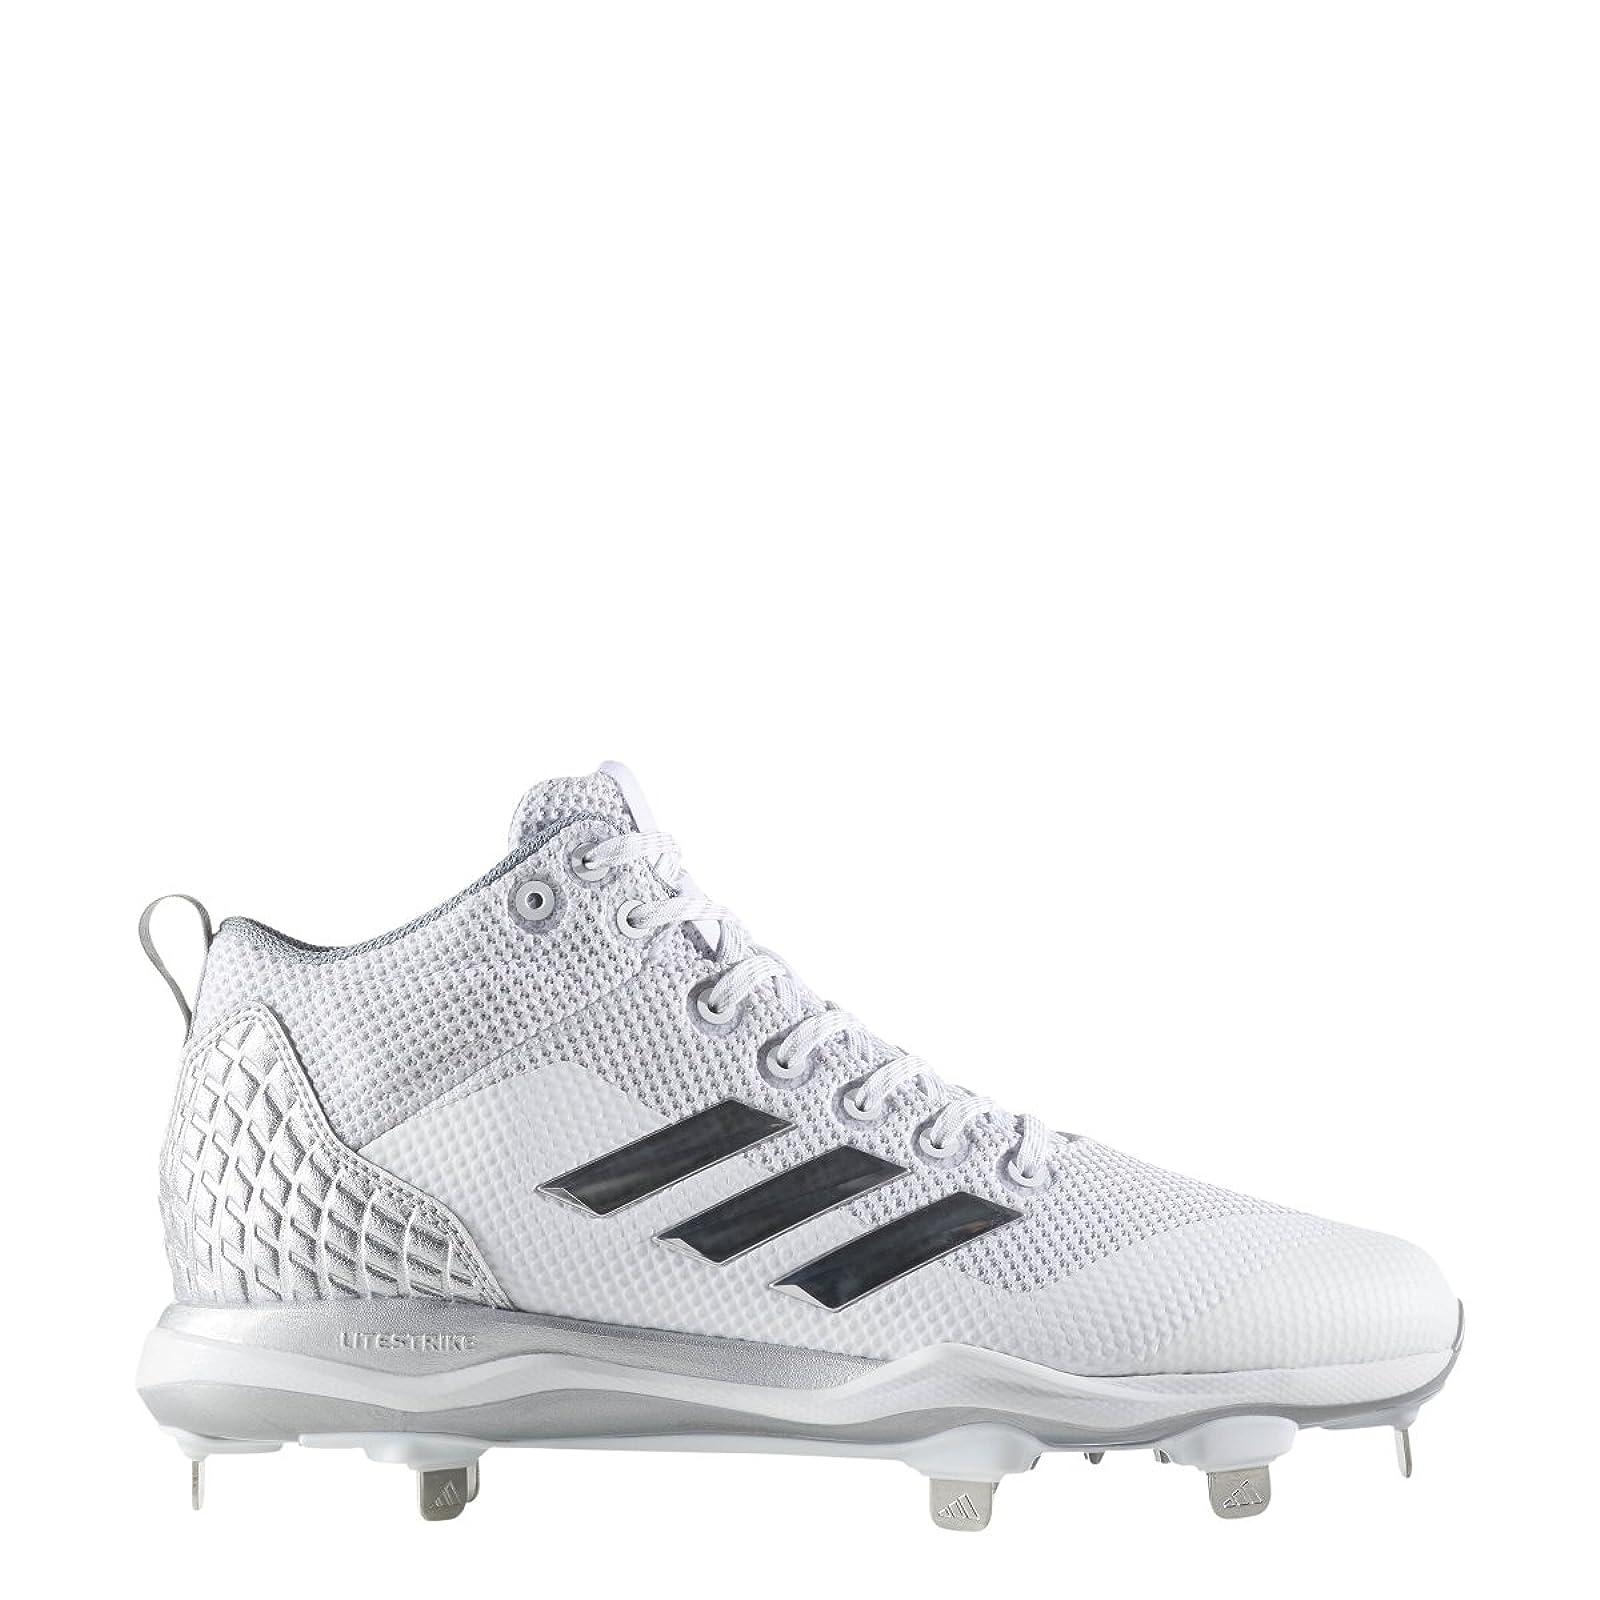 adidas Men's Freak X Carbon Mid Baseball Shoe B39200 - 1